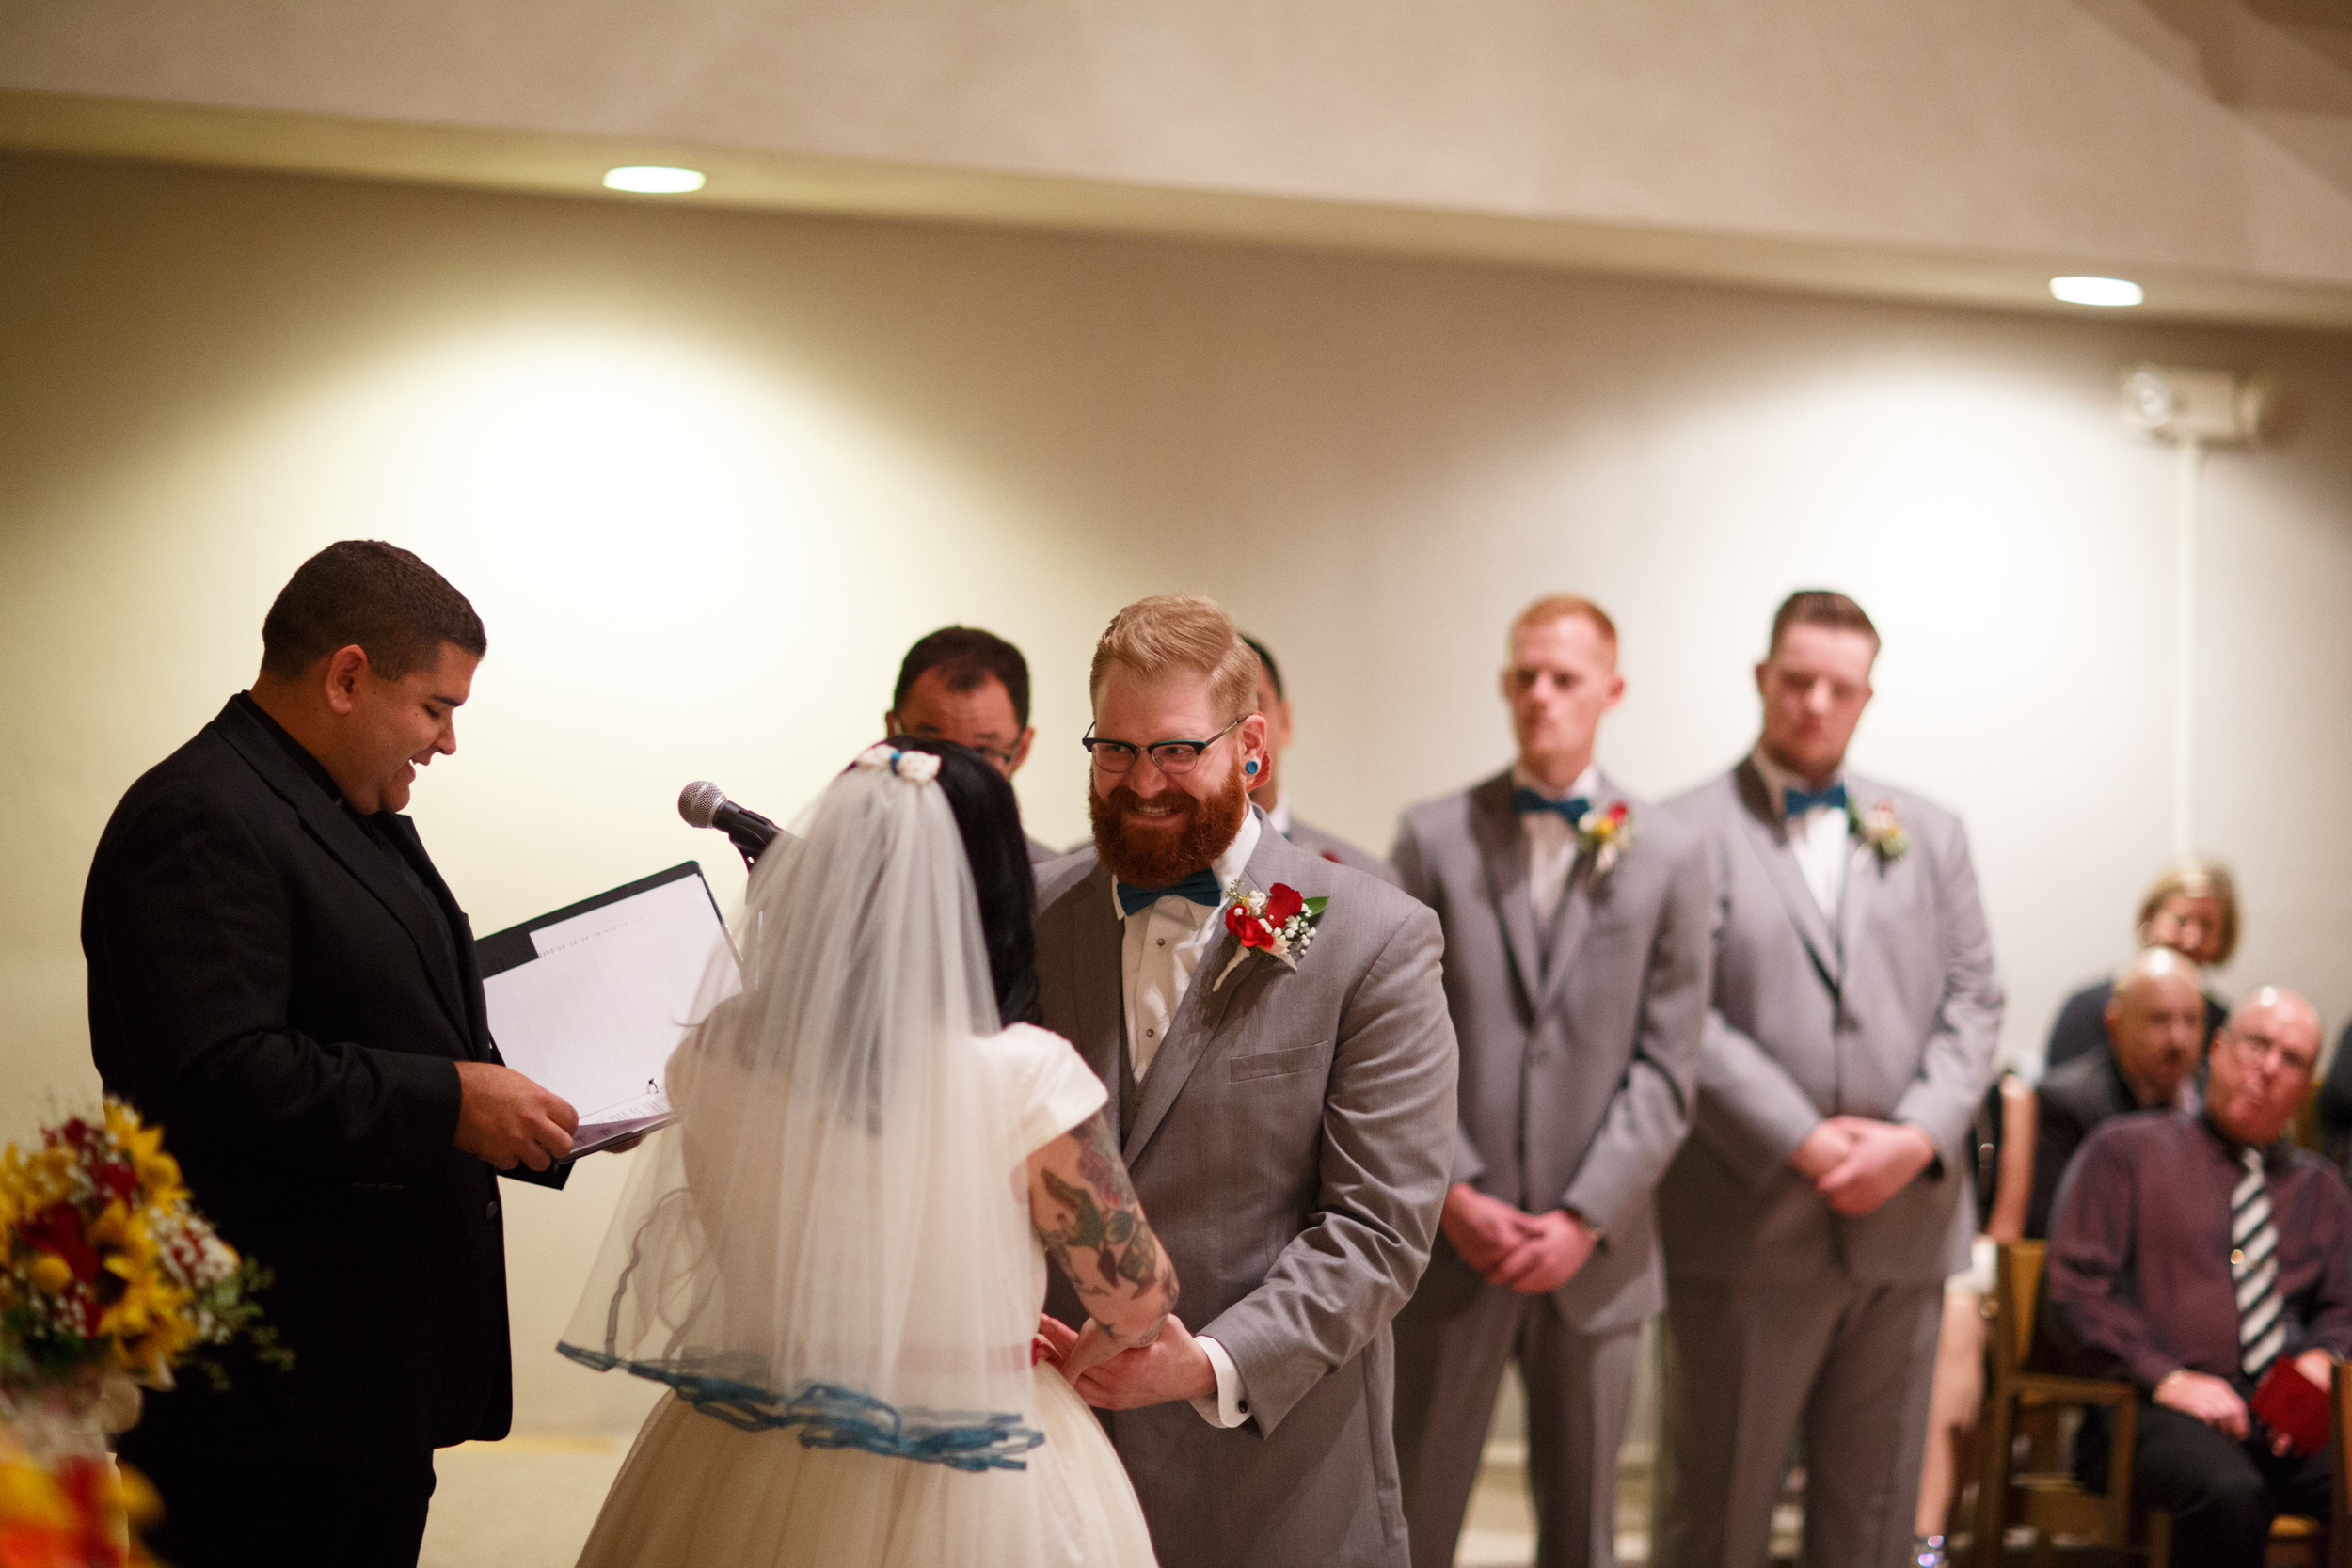 Christian & Sarah wedding photography by Brian milo-162.jpg